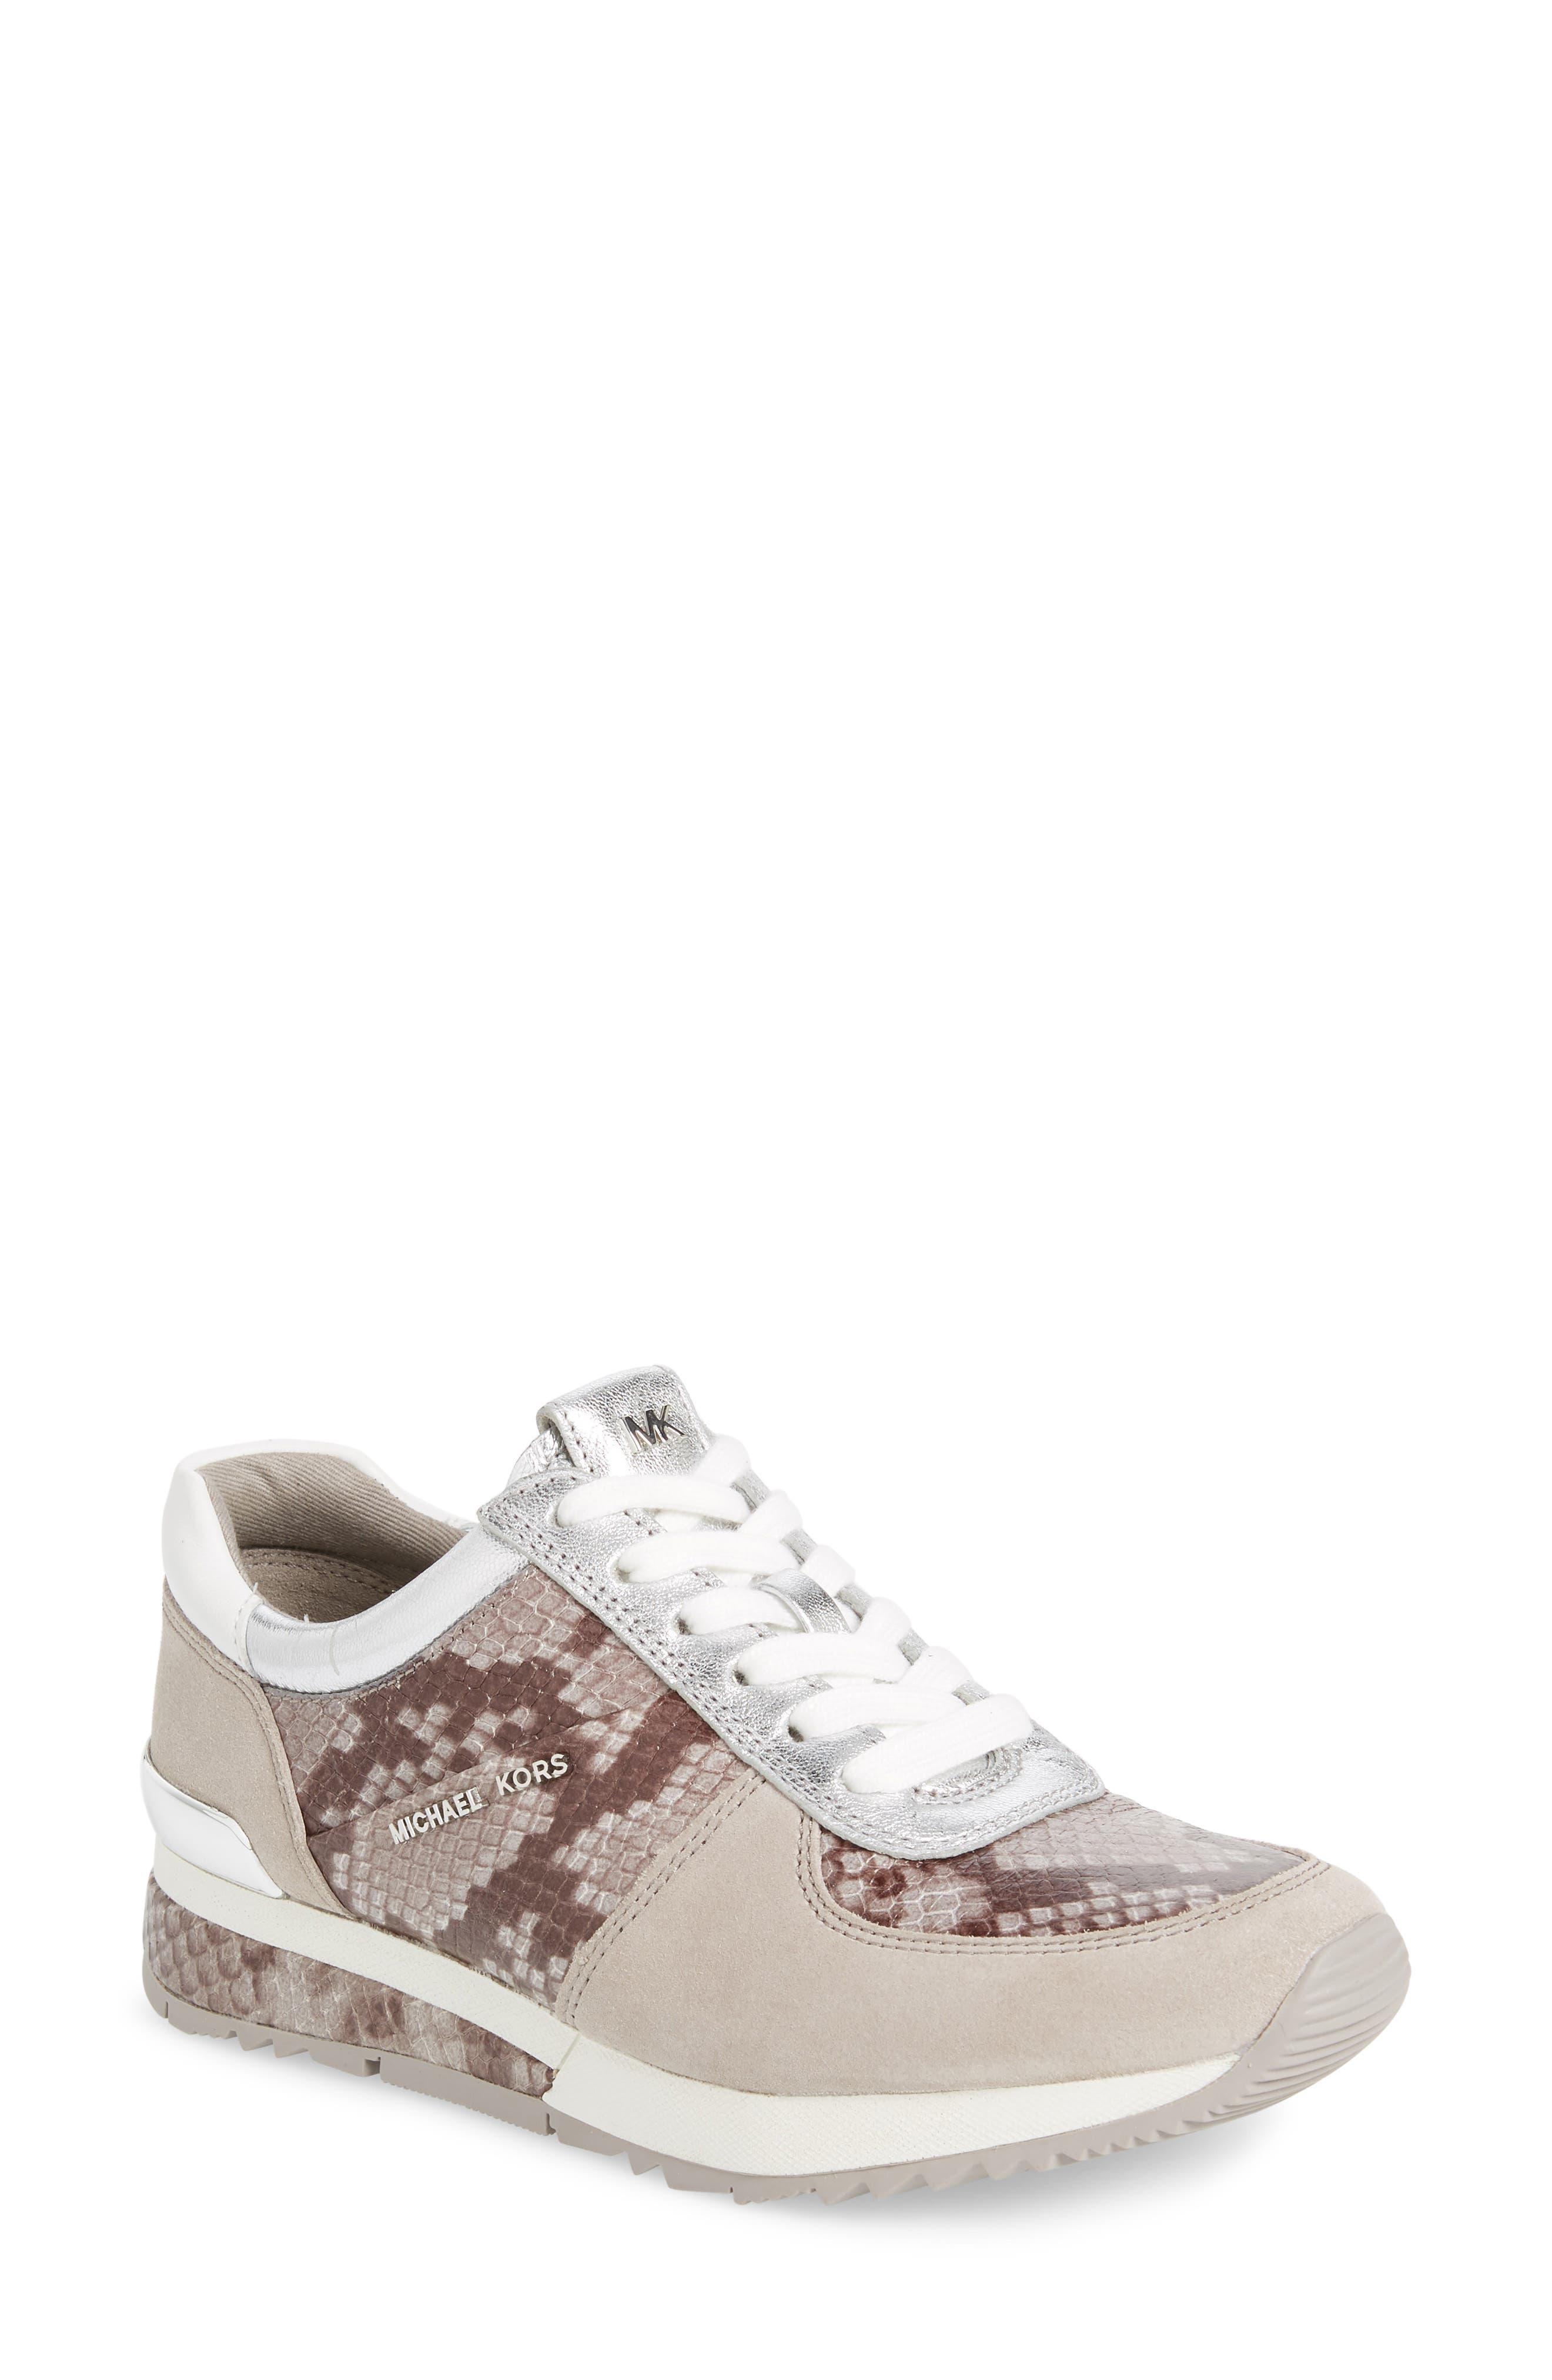 3fd2f4a603a Shoe Steals  Women s MICHAEL Michael Kors Sneakers